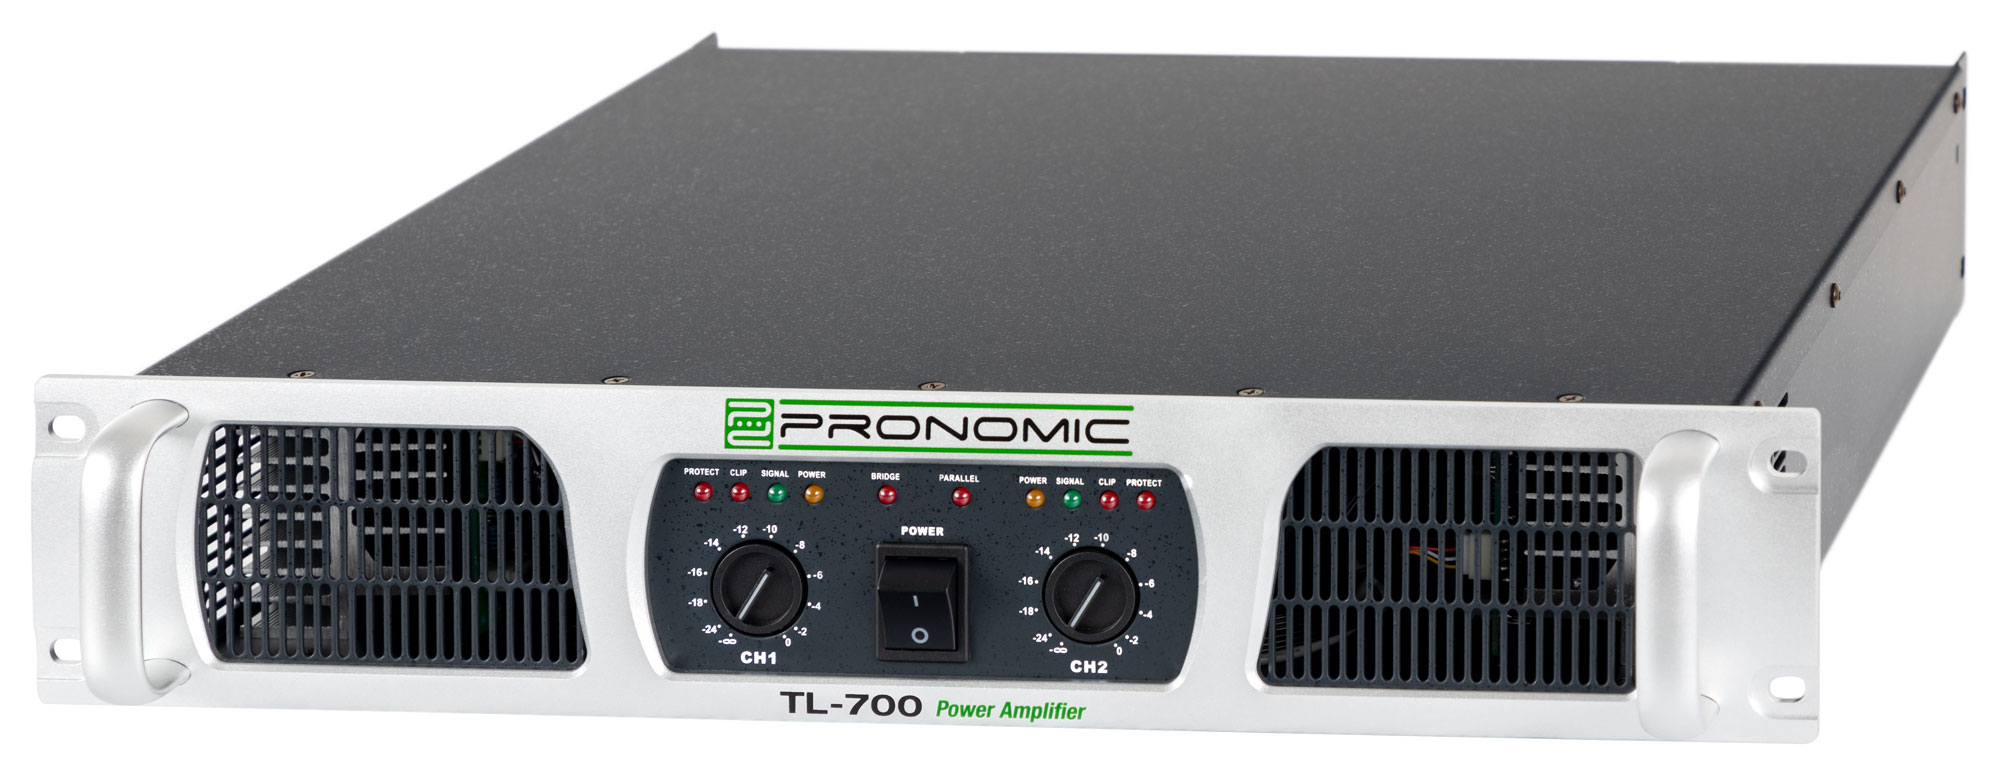 Paendstufen - Pronomic TL 700 Endstufe 2x 1600 Watt - Onlineshop Musikhaus Kirstein